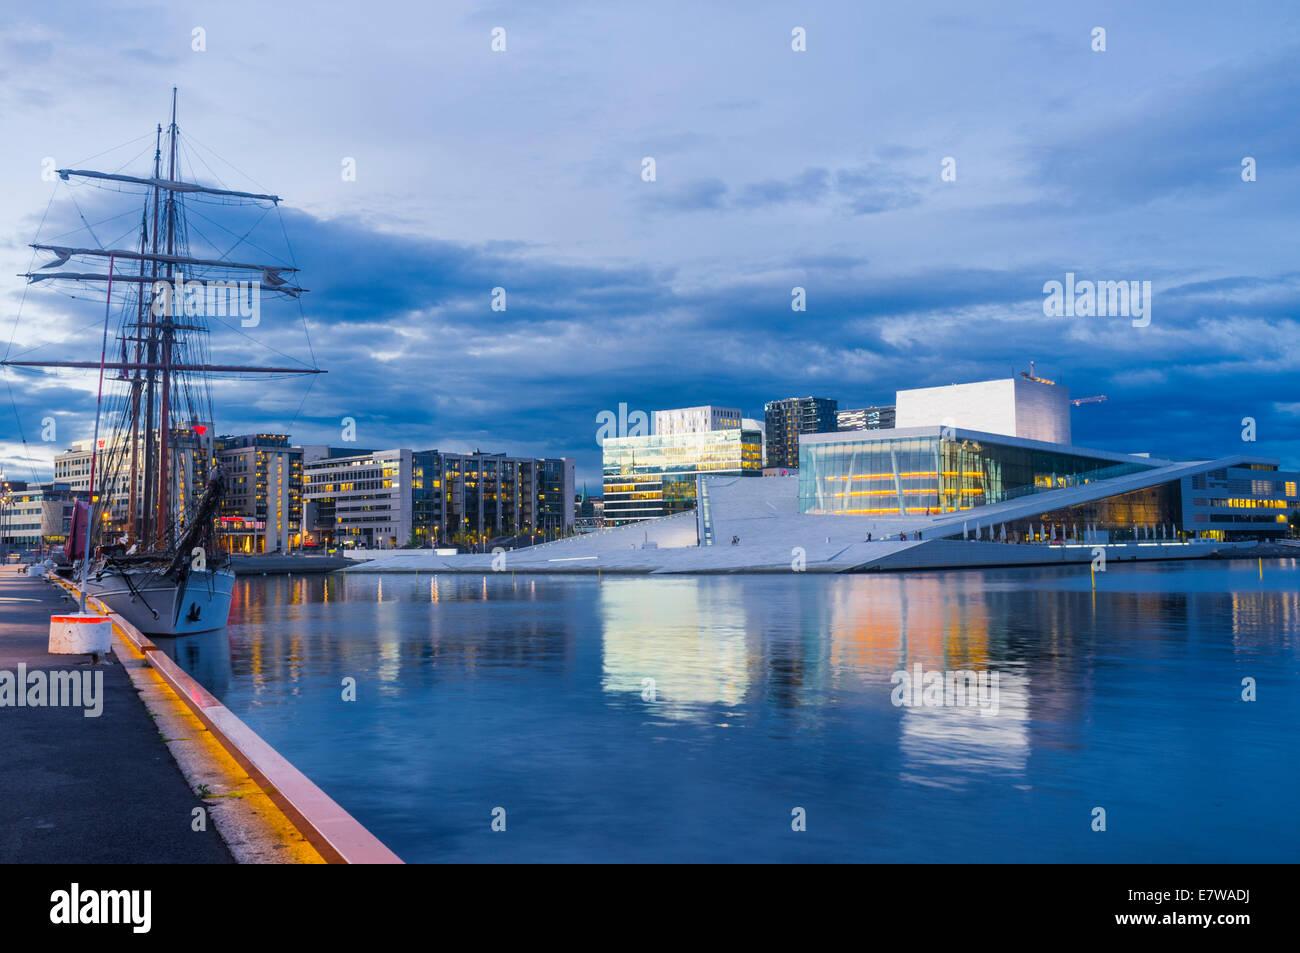 Oslo Opera Hall and sailboat at dusk, Norway - Stock Image